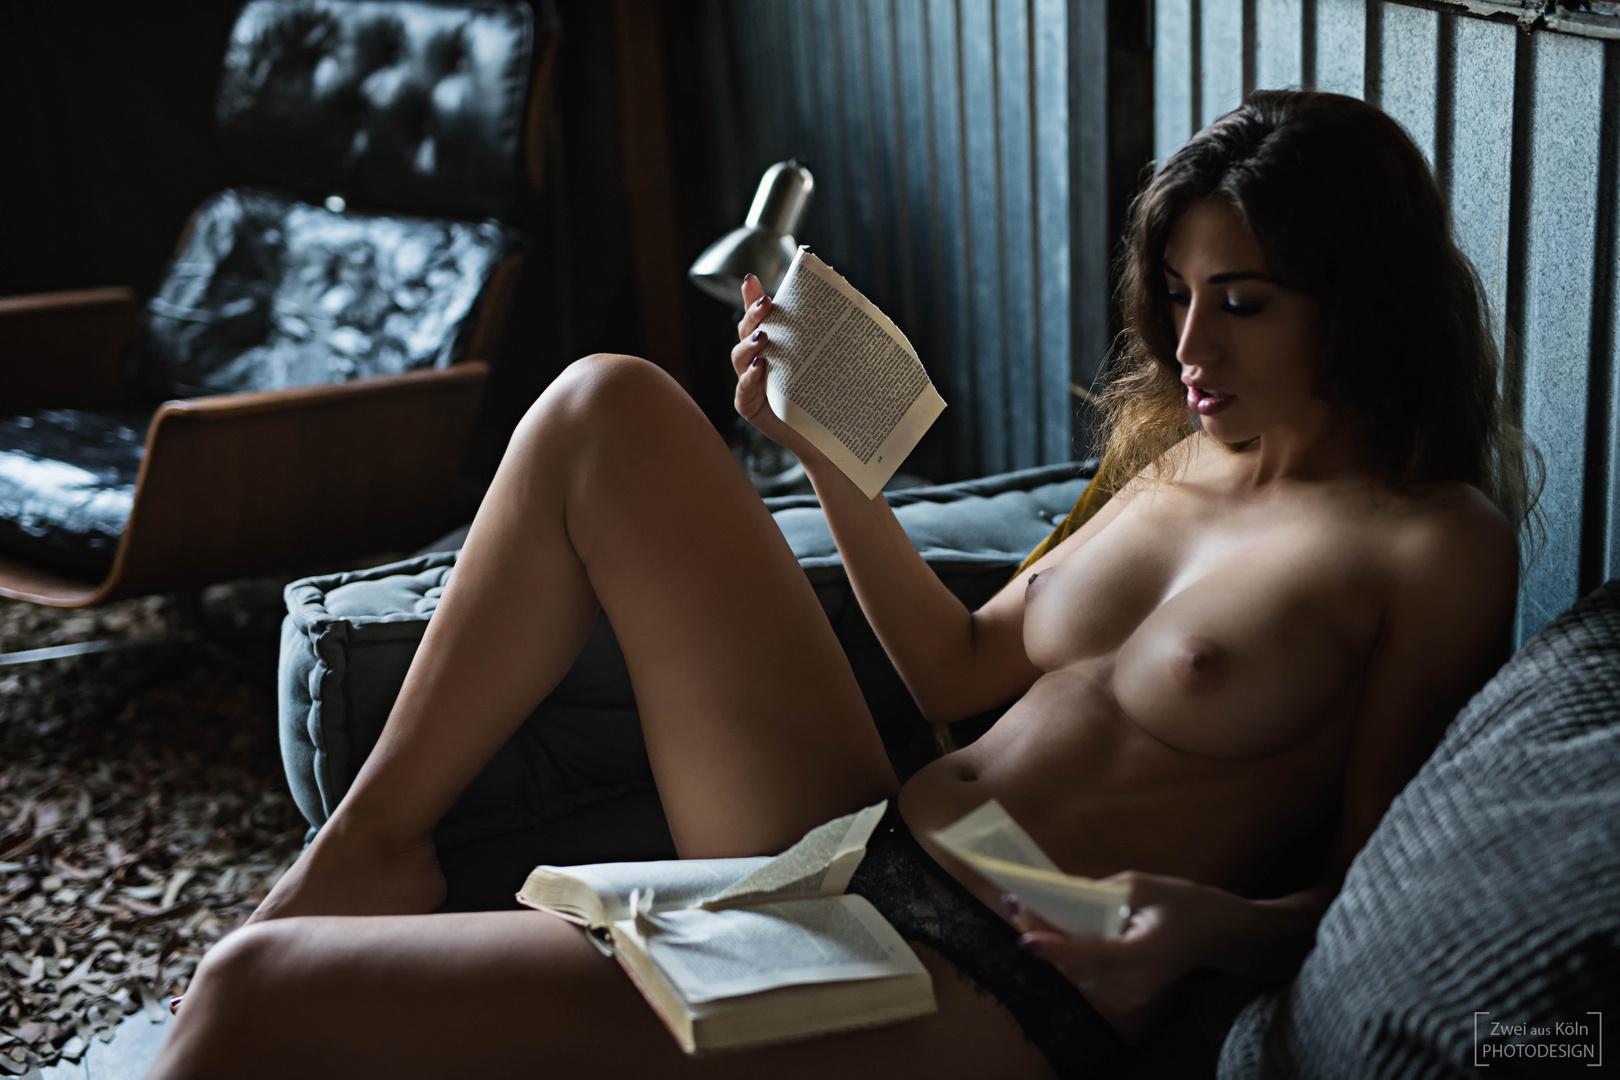 stay-home-and-read-a-book-87fc1aa7-ba9c-4d87-a0ef-5799a516c36d